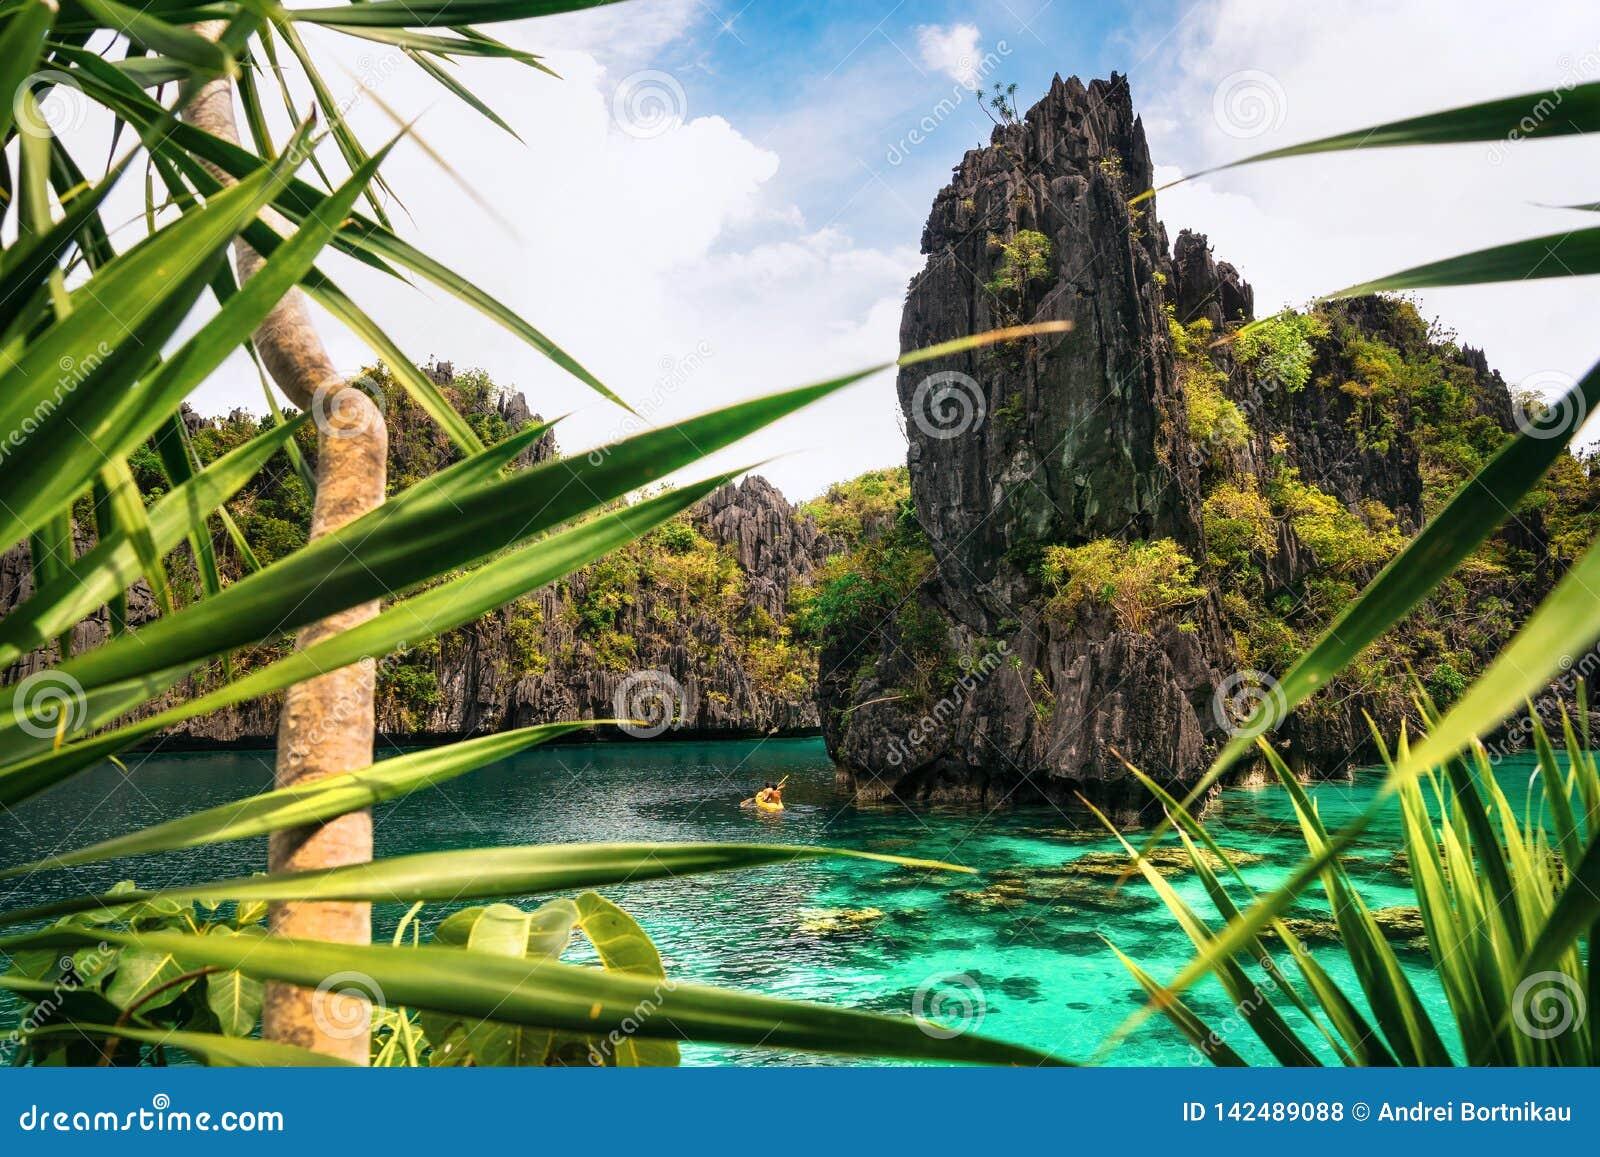 Kayak In The Big Lagoon El Nido Palawan Philippines Stock